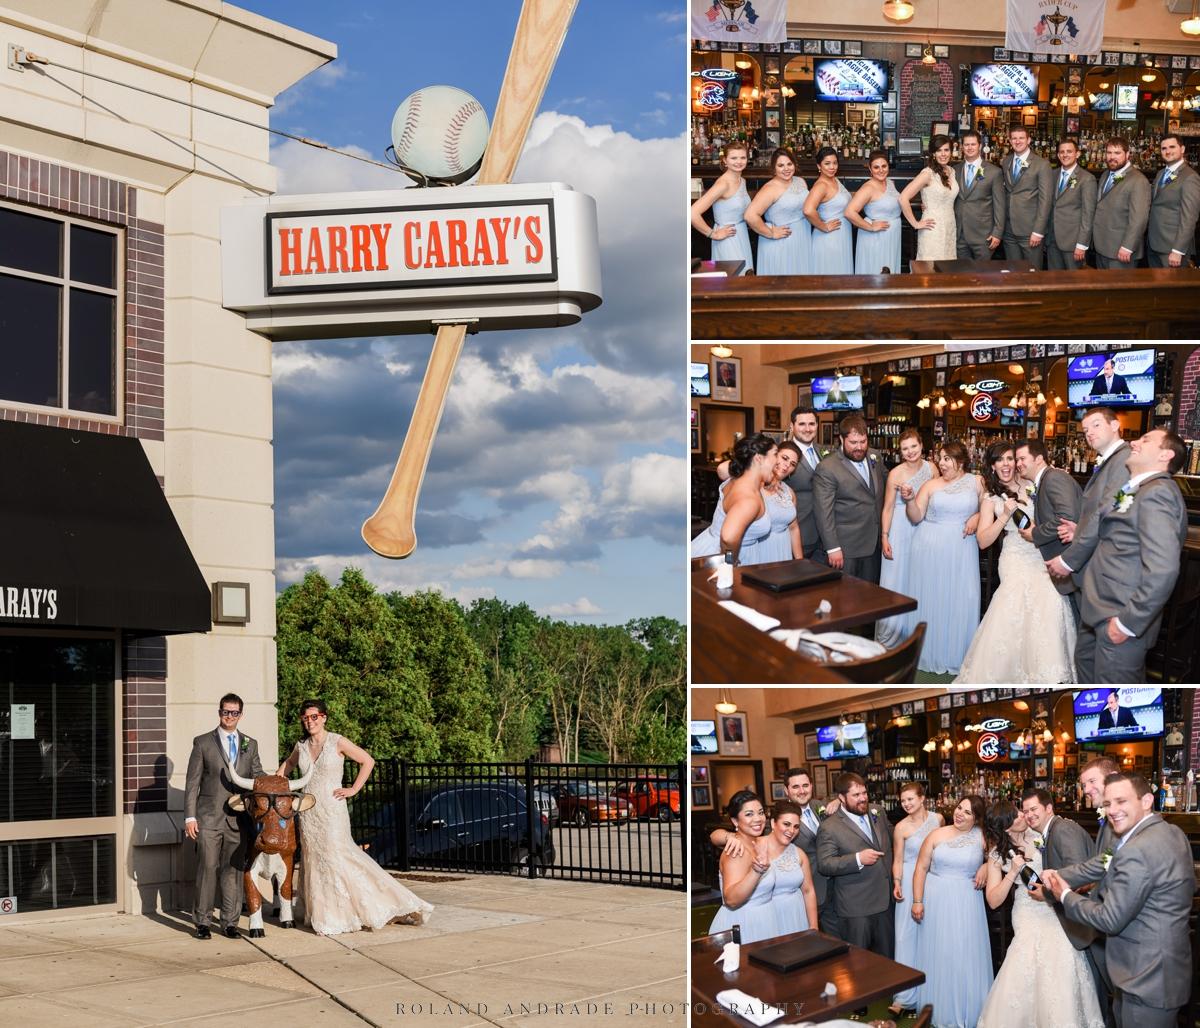 Chicago Wedding Photographer Harry Caray's Wedding Lombard Illinois Cubs Wedding_0026.jpg